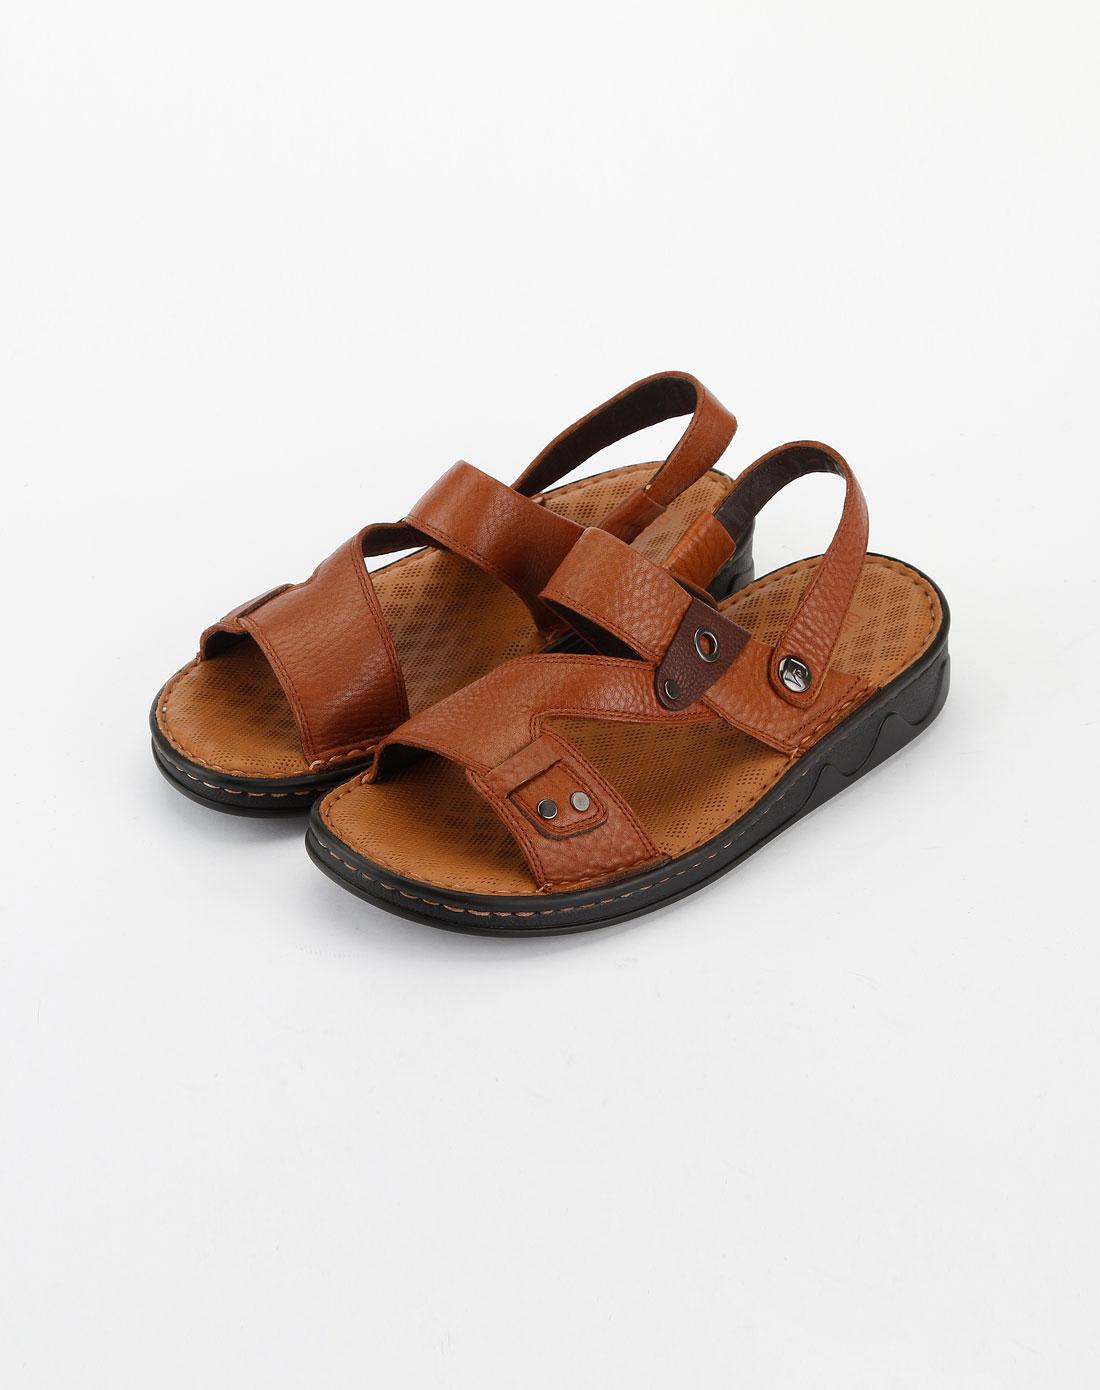 cardin-男装土黄色时尚休闲皮凉鞋